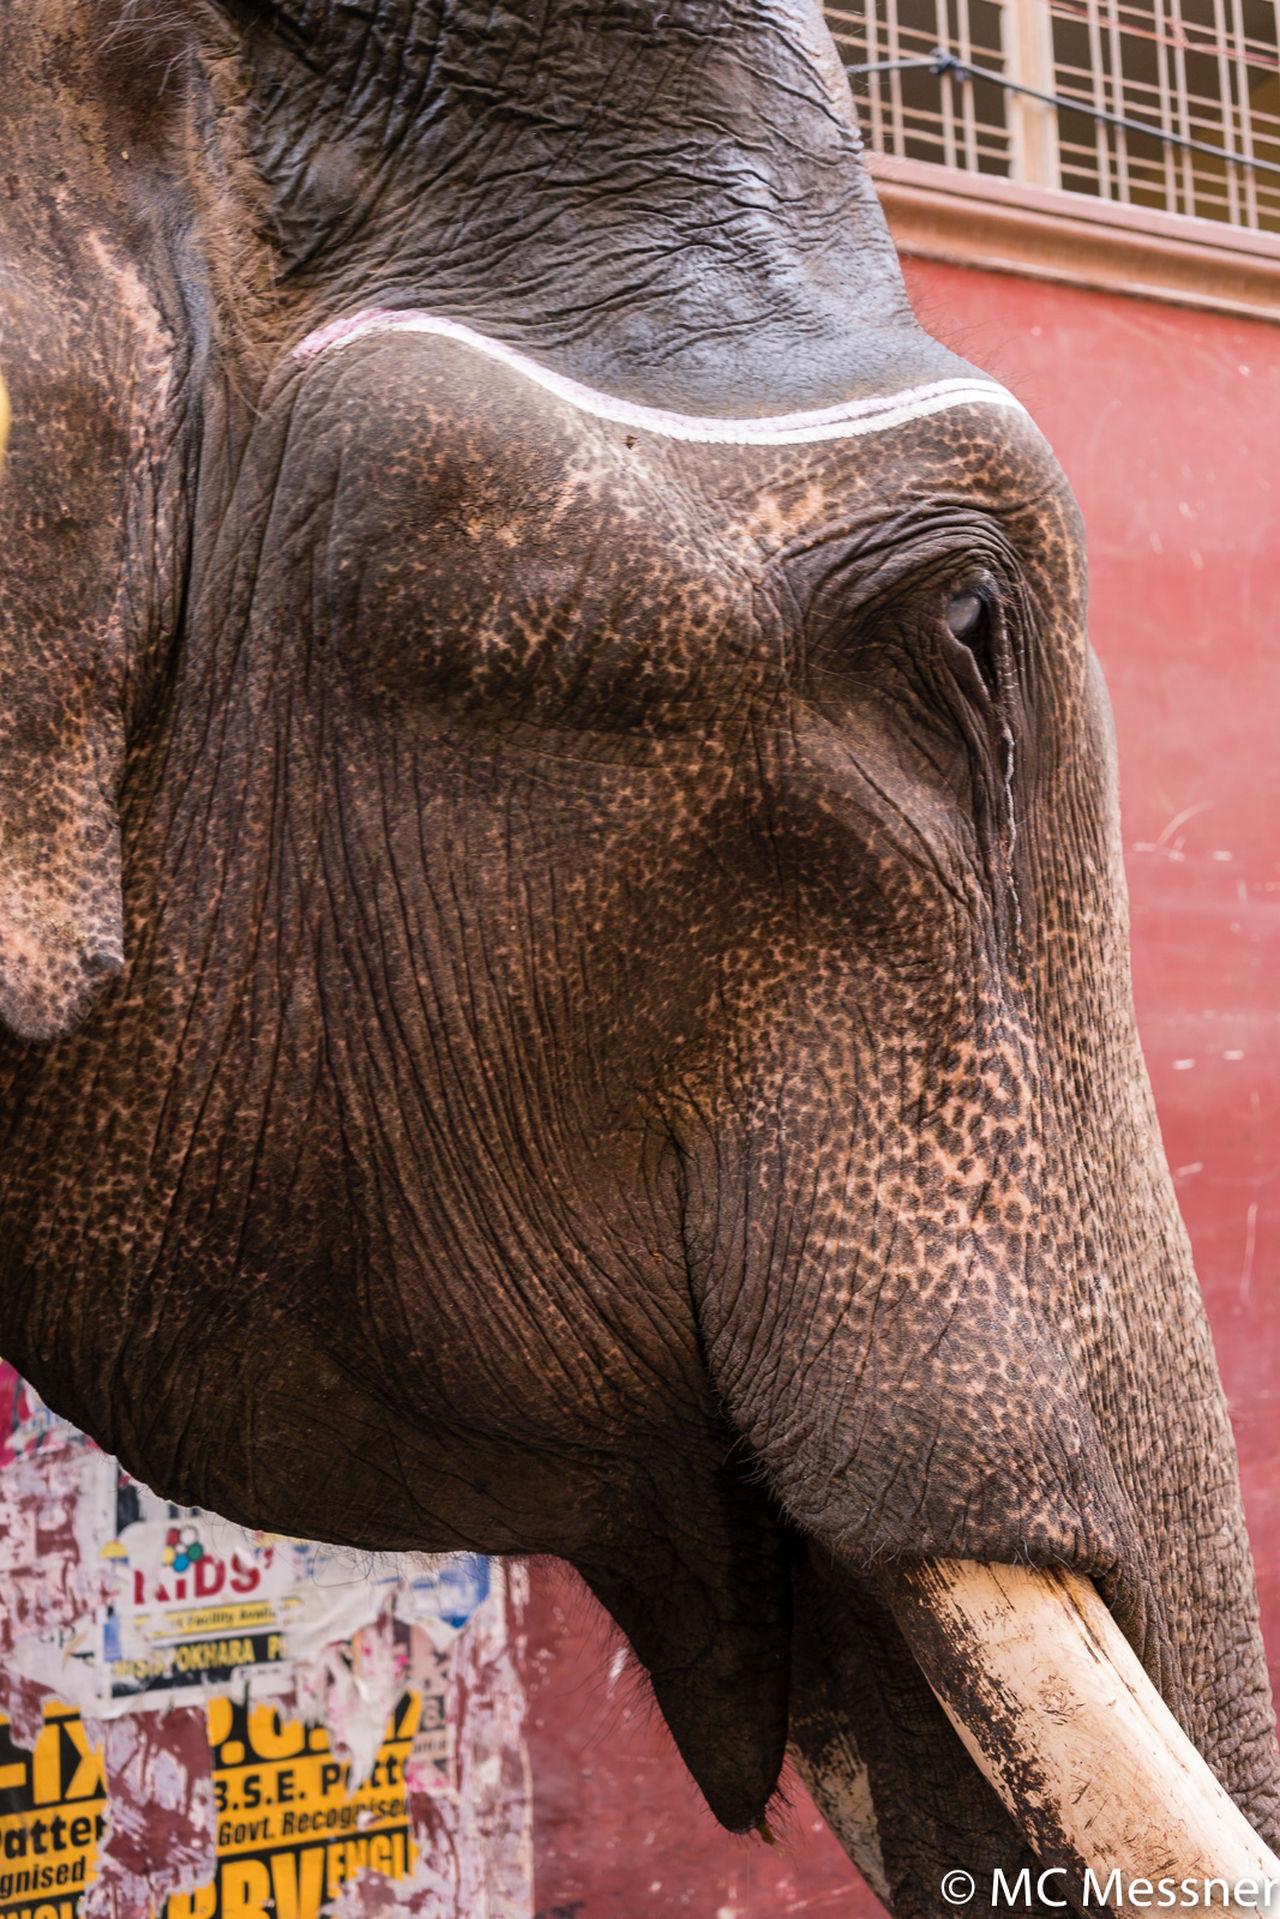 Animal Asian Elephant Close-up Elephant Everyday Life India Indian Elephant Indiapictures No People Street Photography Streetphotography Travel Travel Photography Varanasi Varanasi Ganges Varanasi India